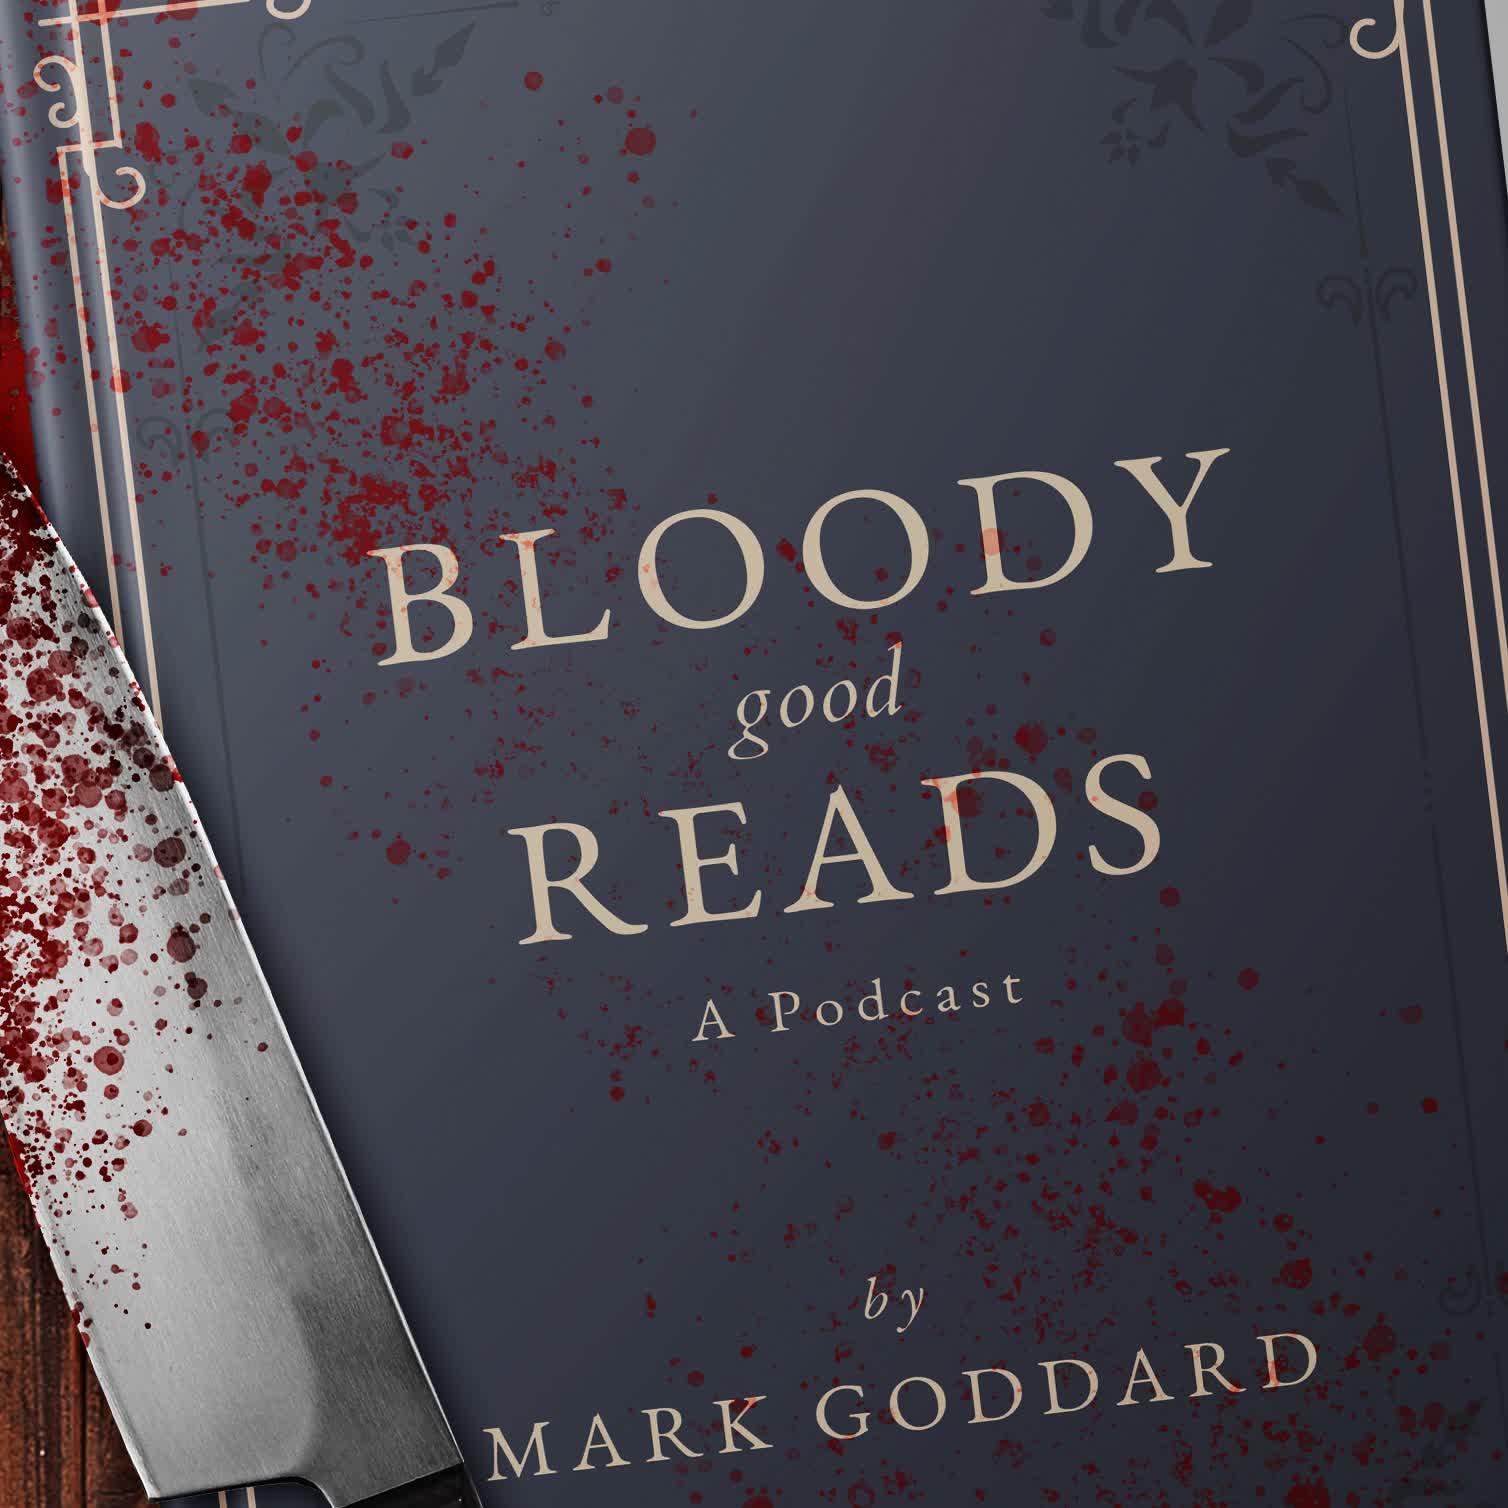 Bloody Good Reads Episode 3 - David Moody